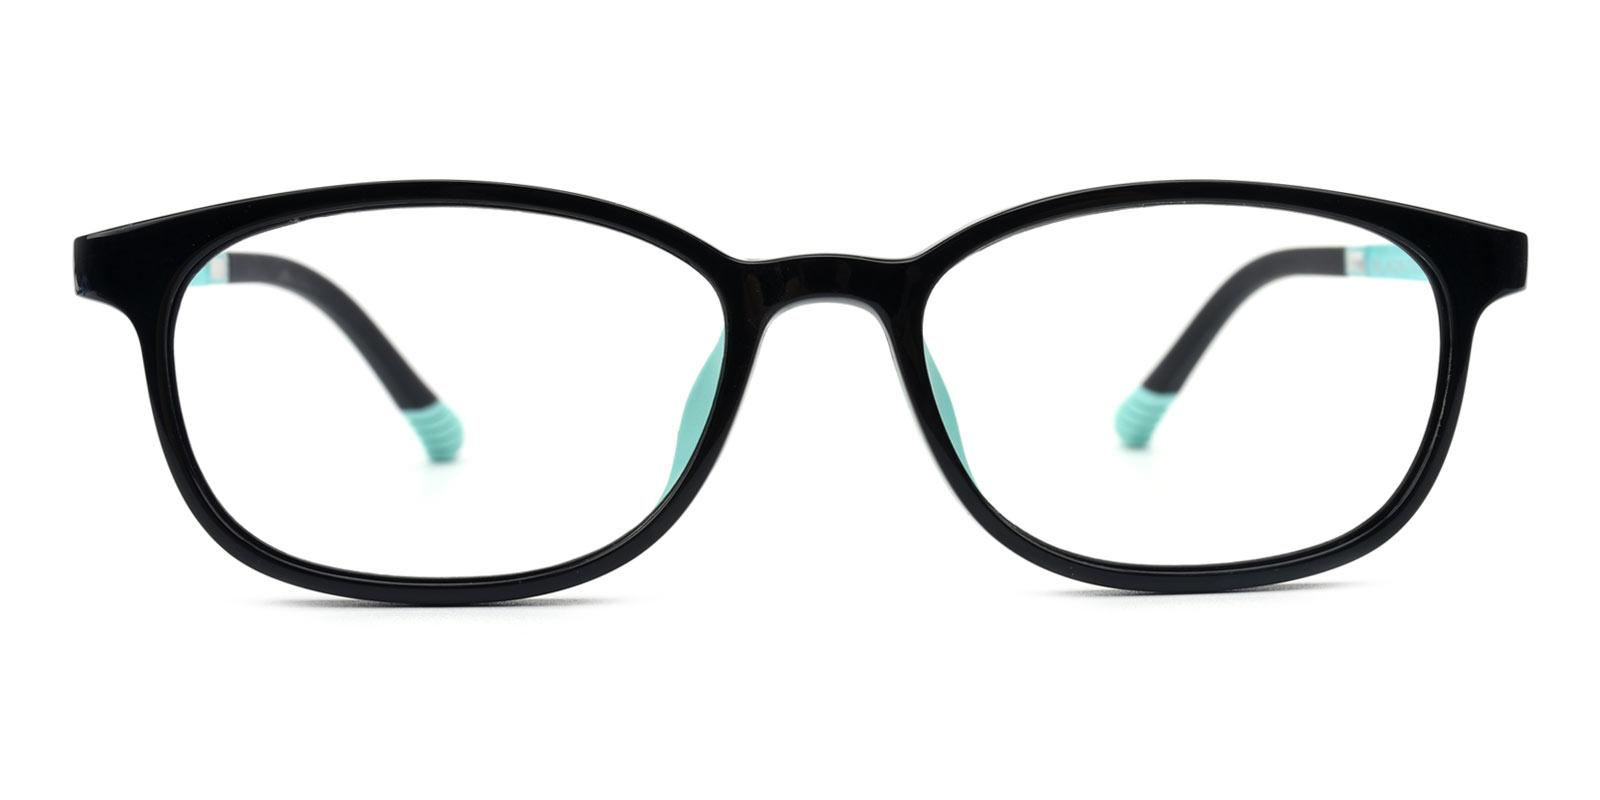 Yvonne-Green-Oval-TR-Eyeglasses-additional2